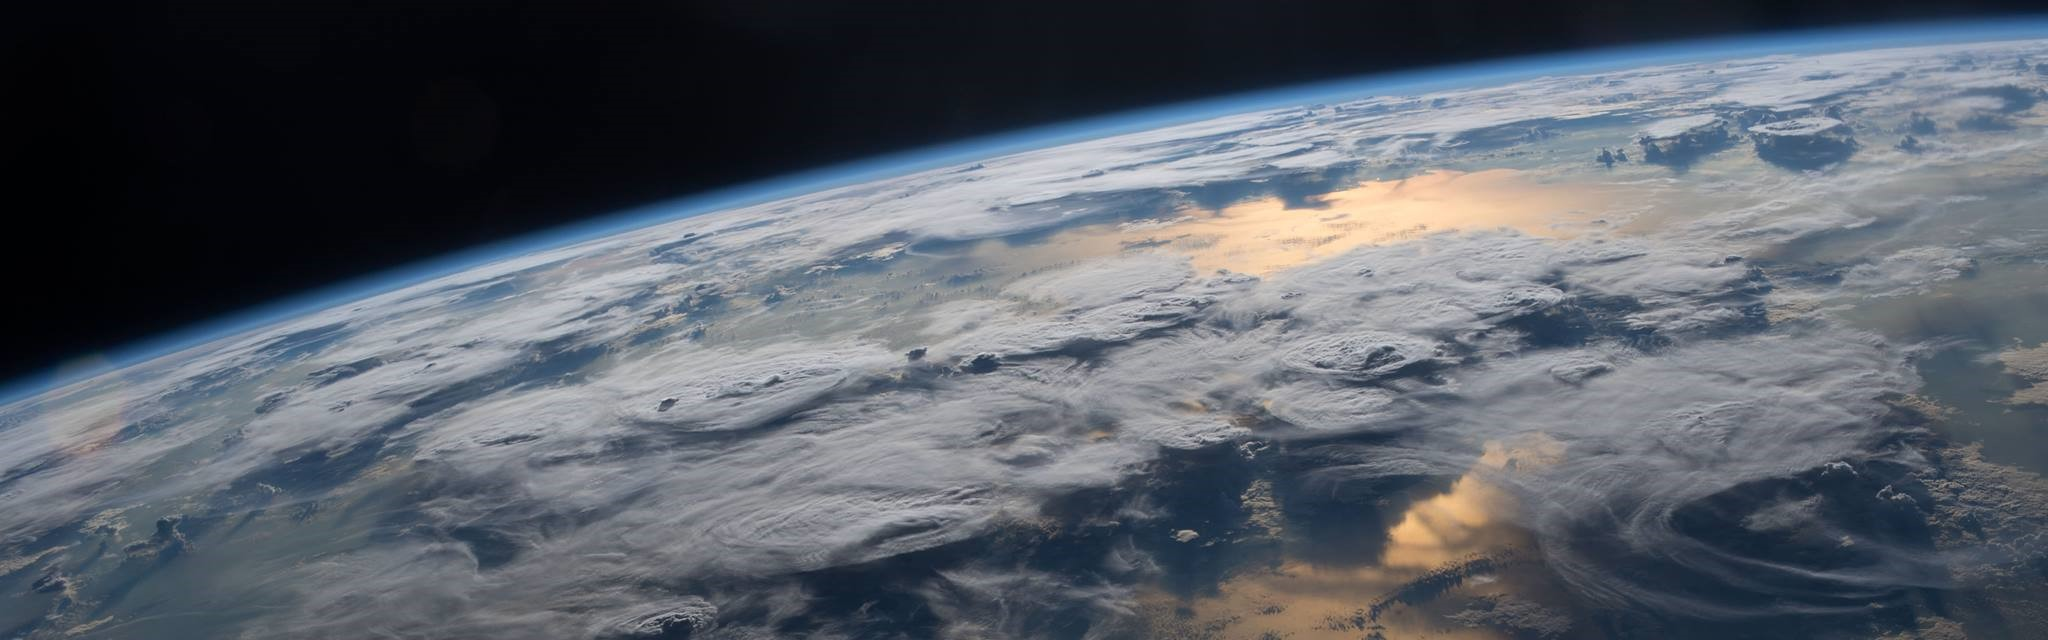 nasa_earth